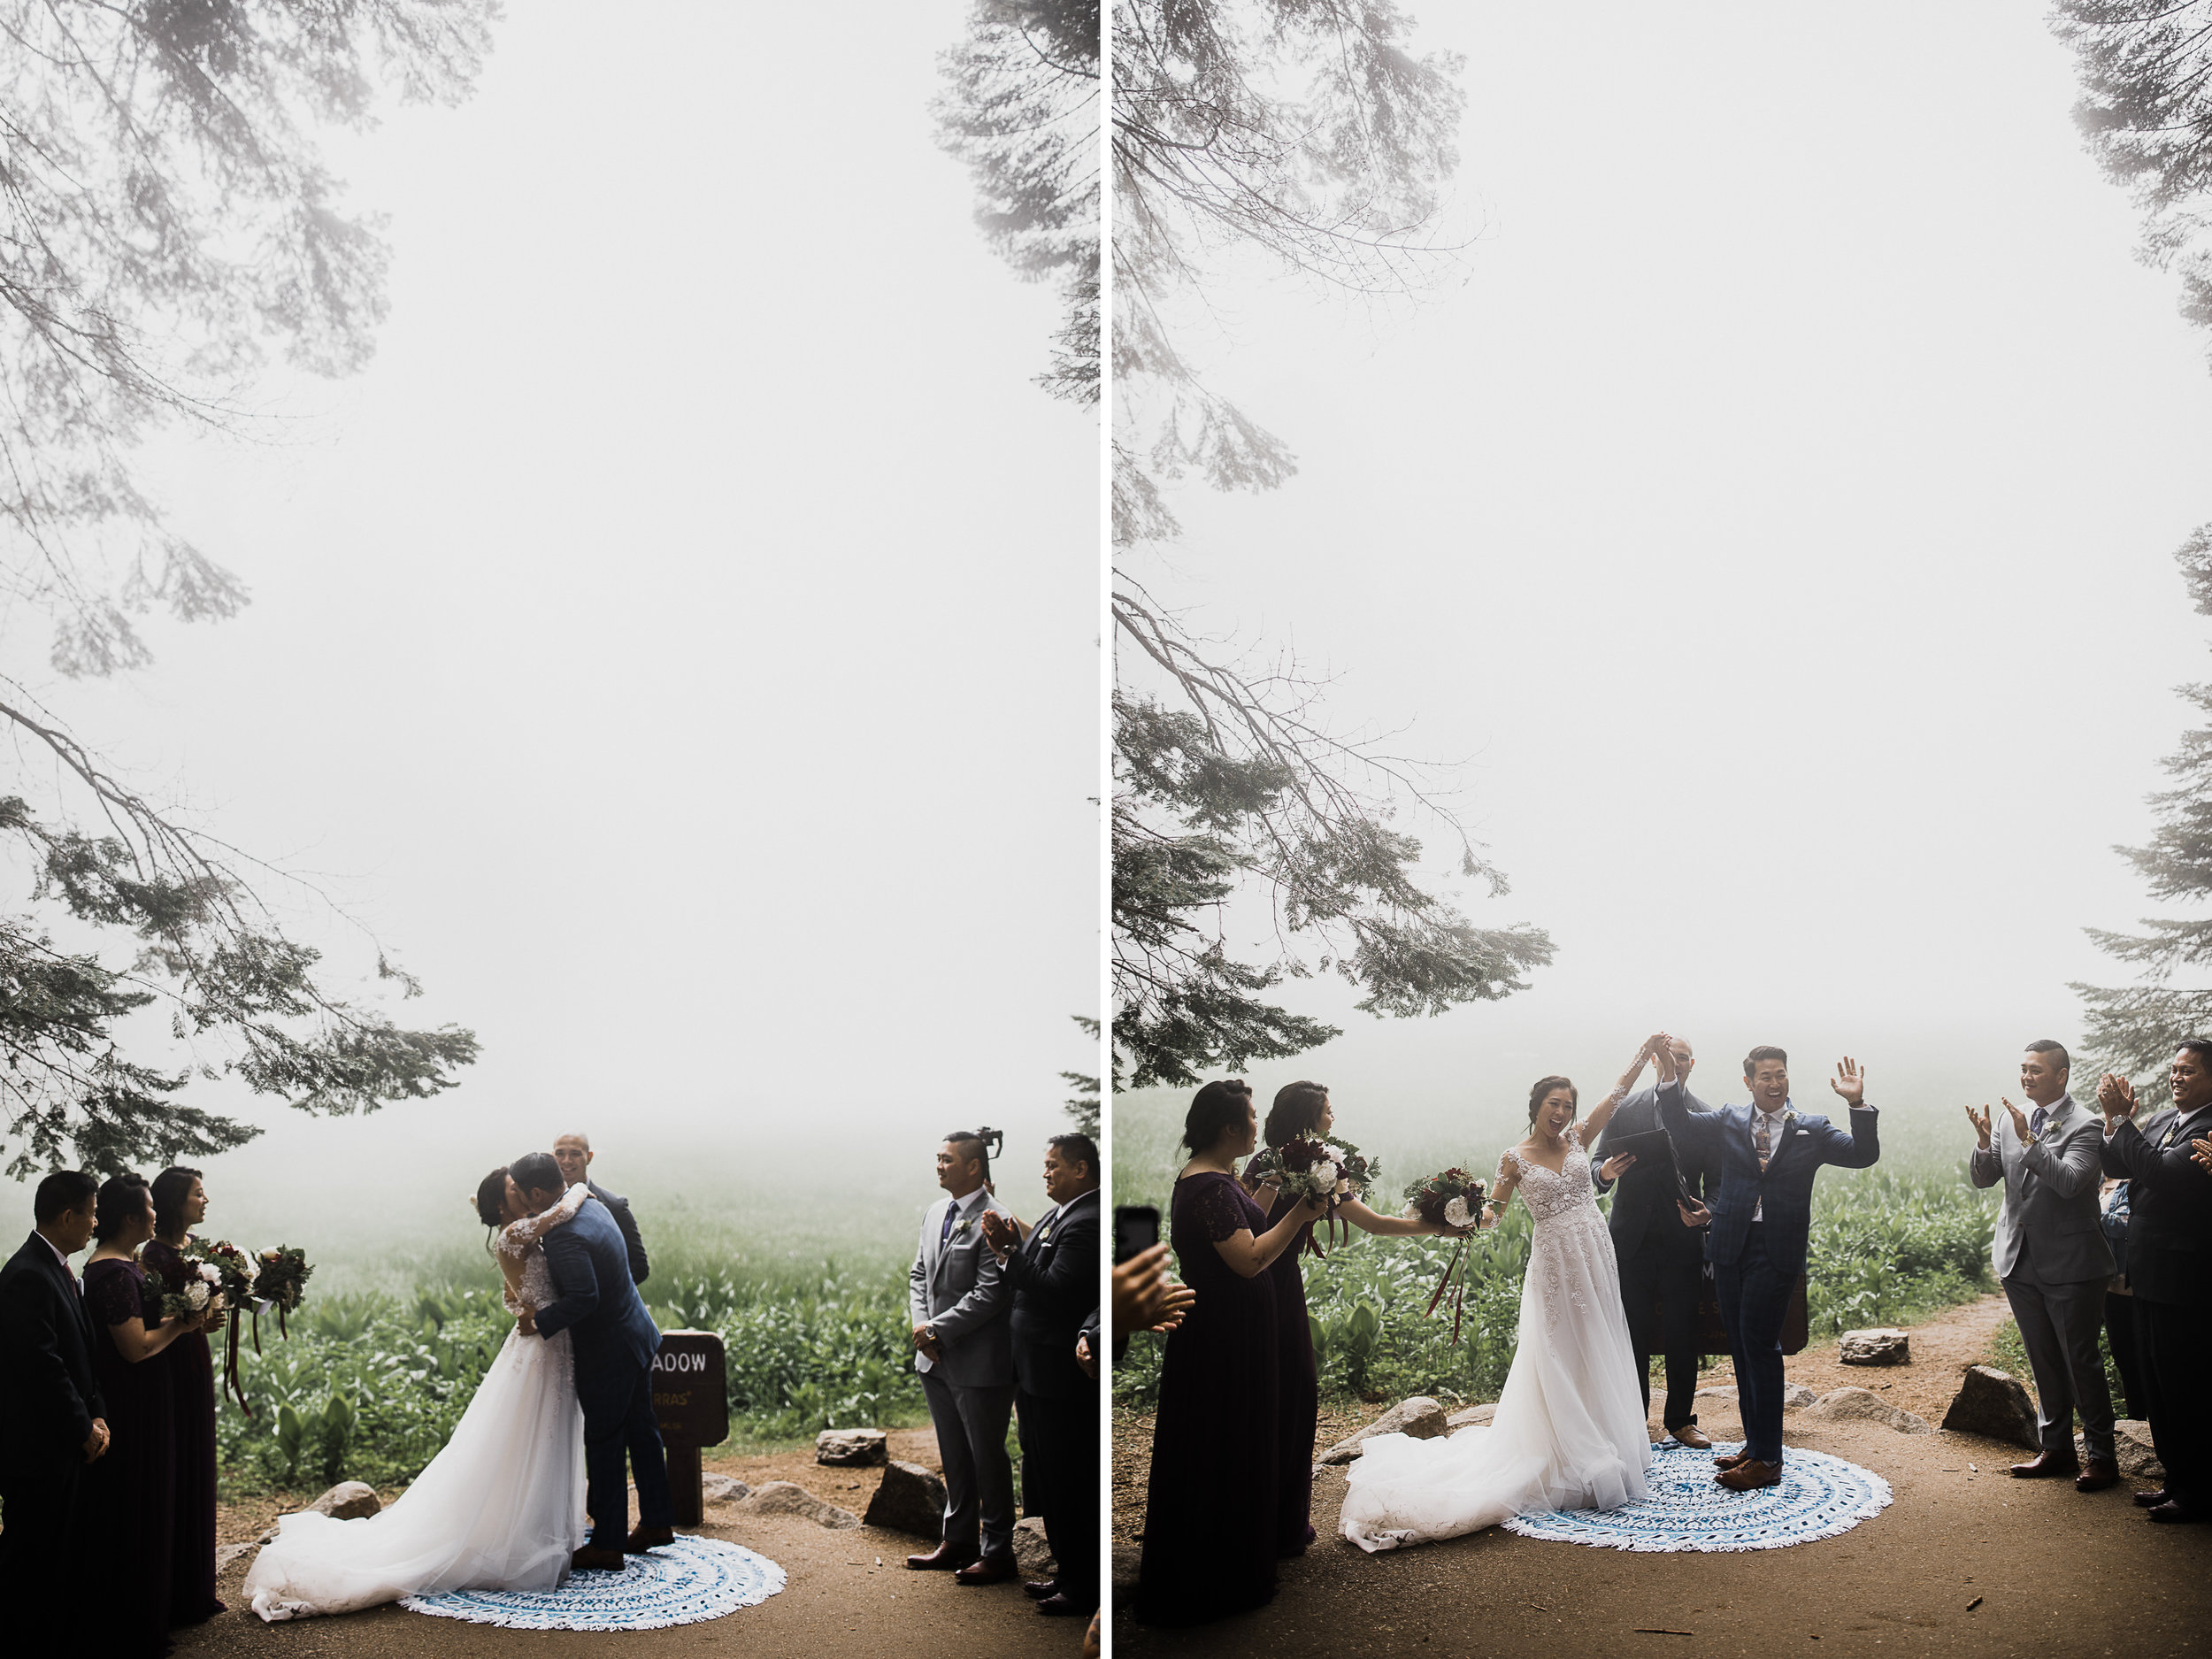 foggy elopement in sequoia national park | destination adventure wedding photographers | the hearnes adventure photography | www.thehearnes.com